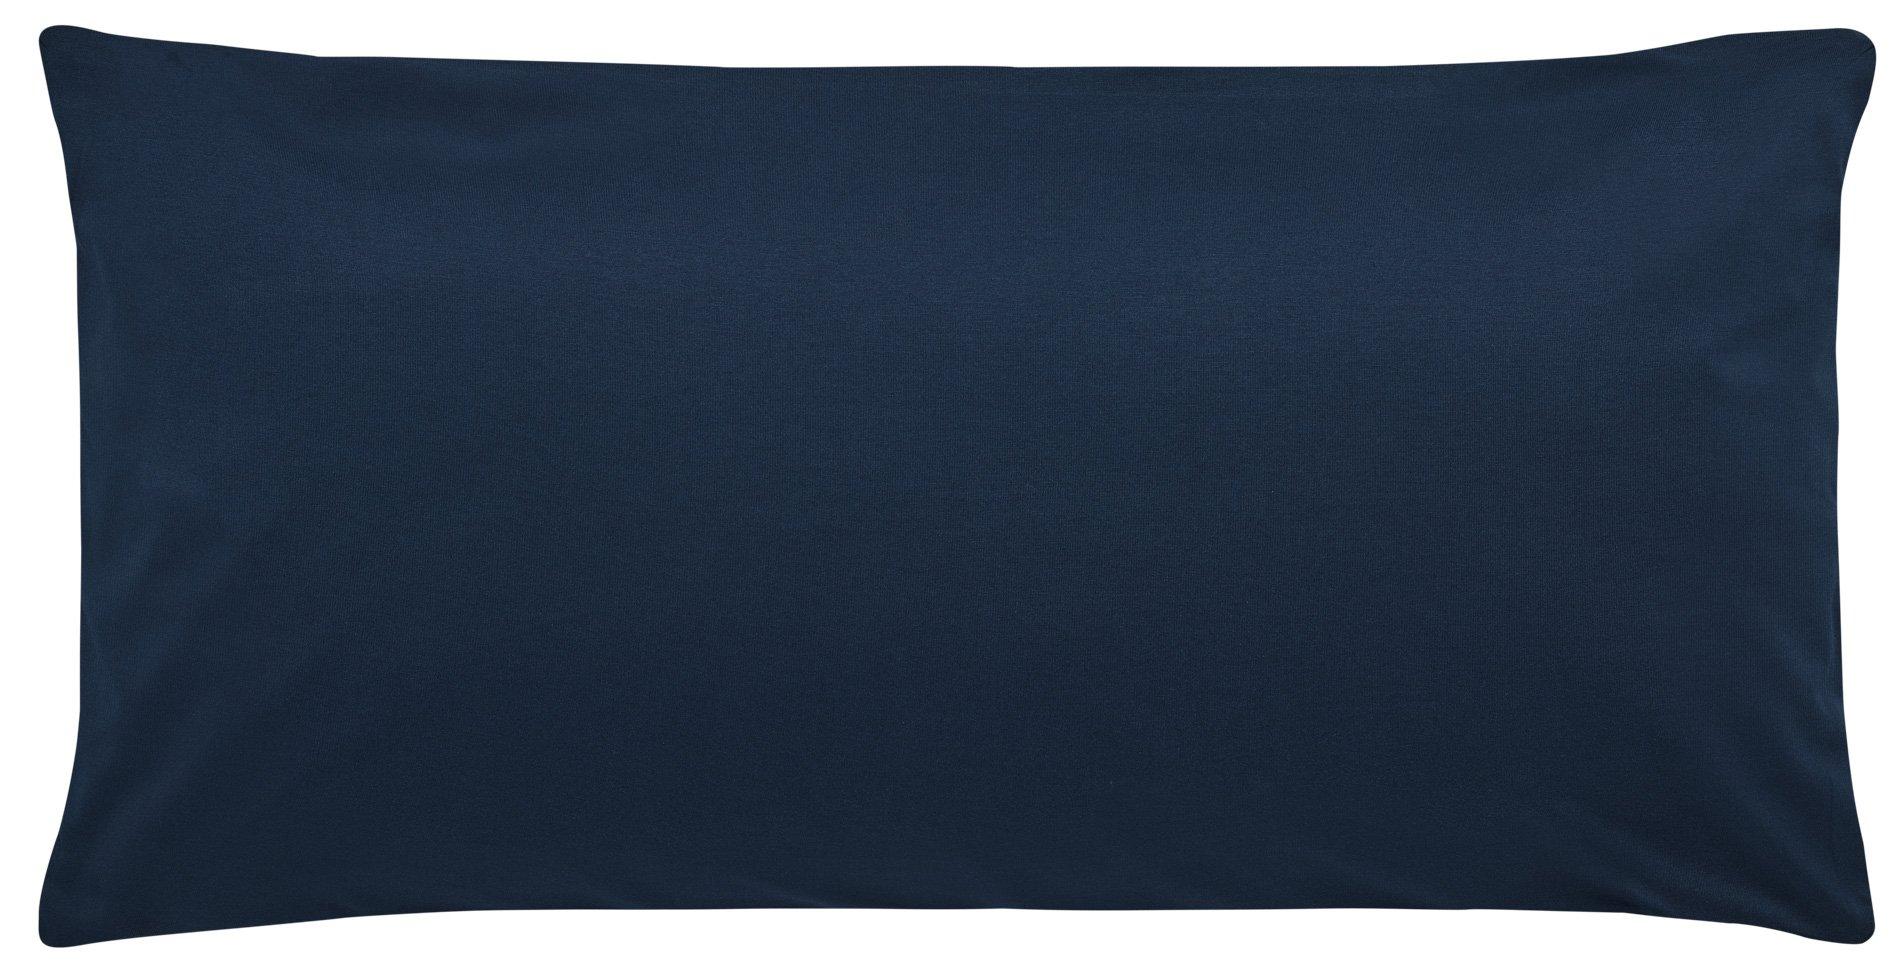 K.-Bezug marine 40x80cm